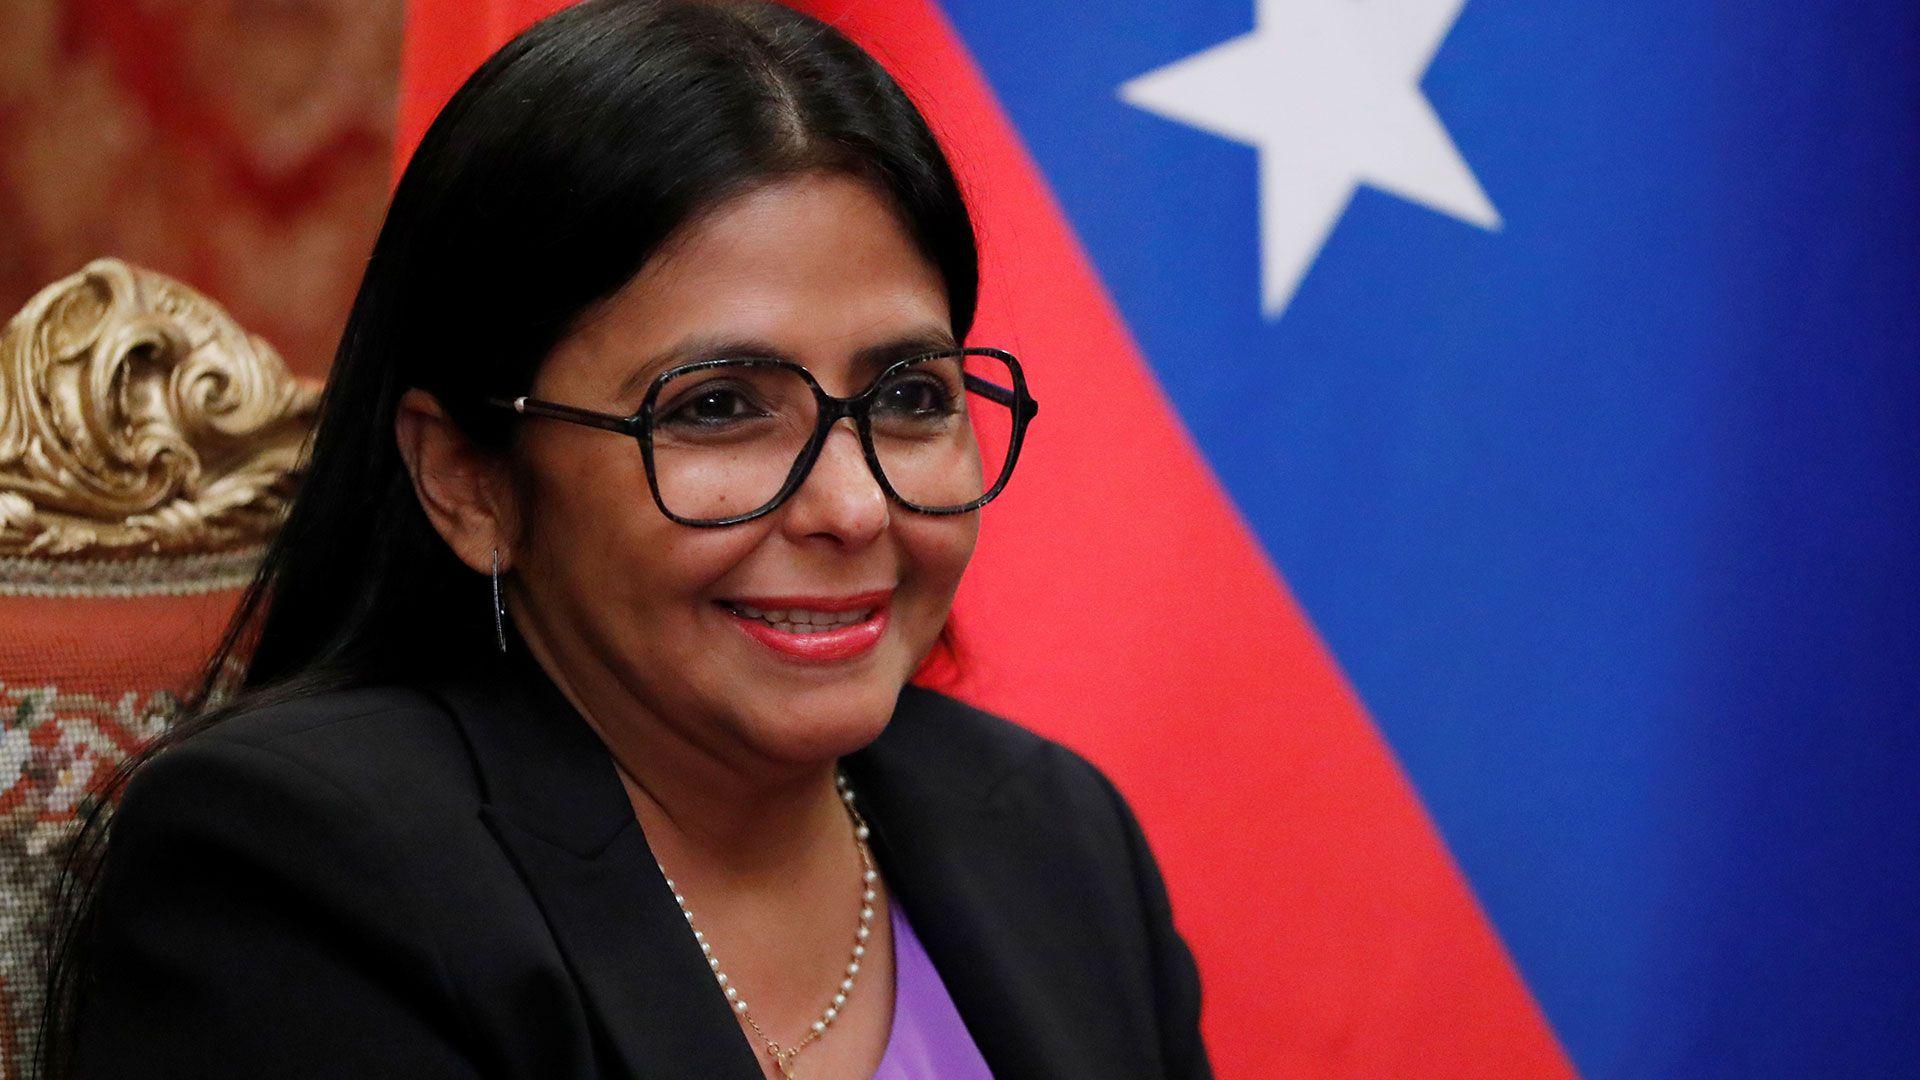 Delcy Rodríguez (REUTERS/Evgenia Novozhenina)